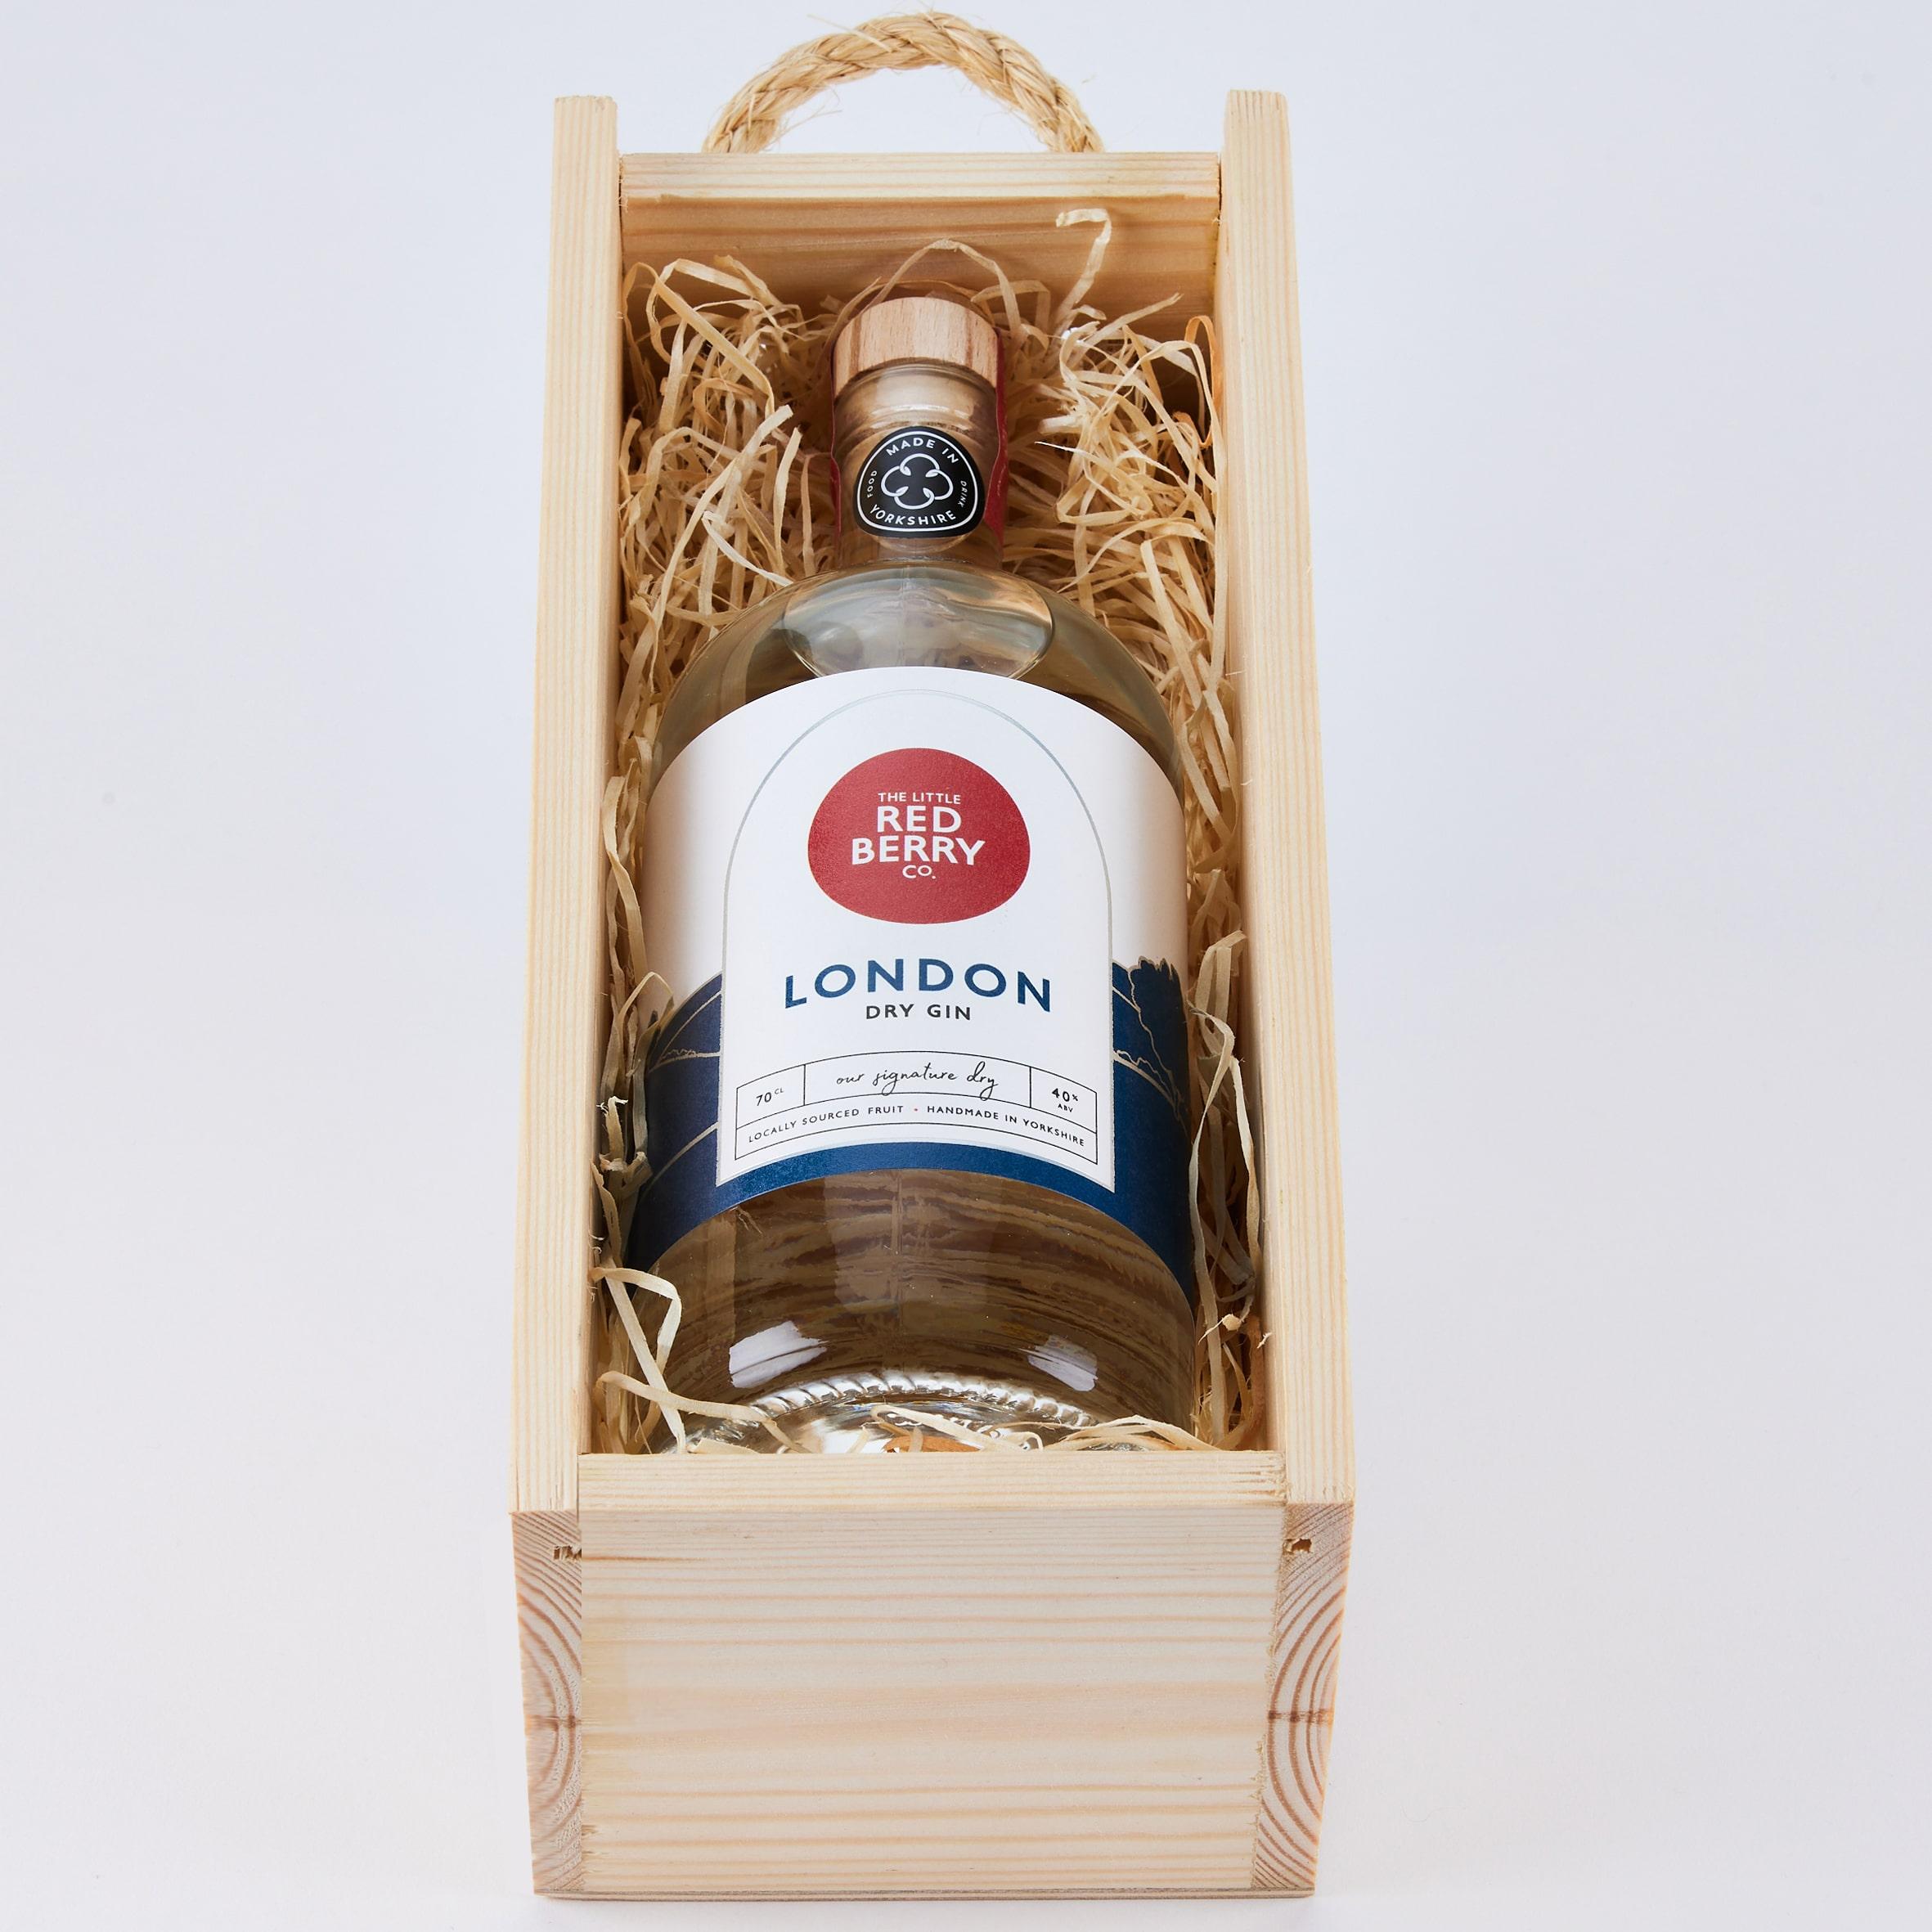 10th Anniversary Wooden Box - London Dry Gin